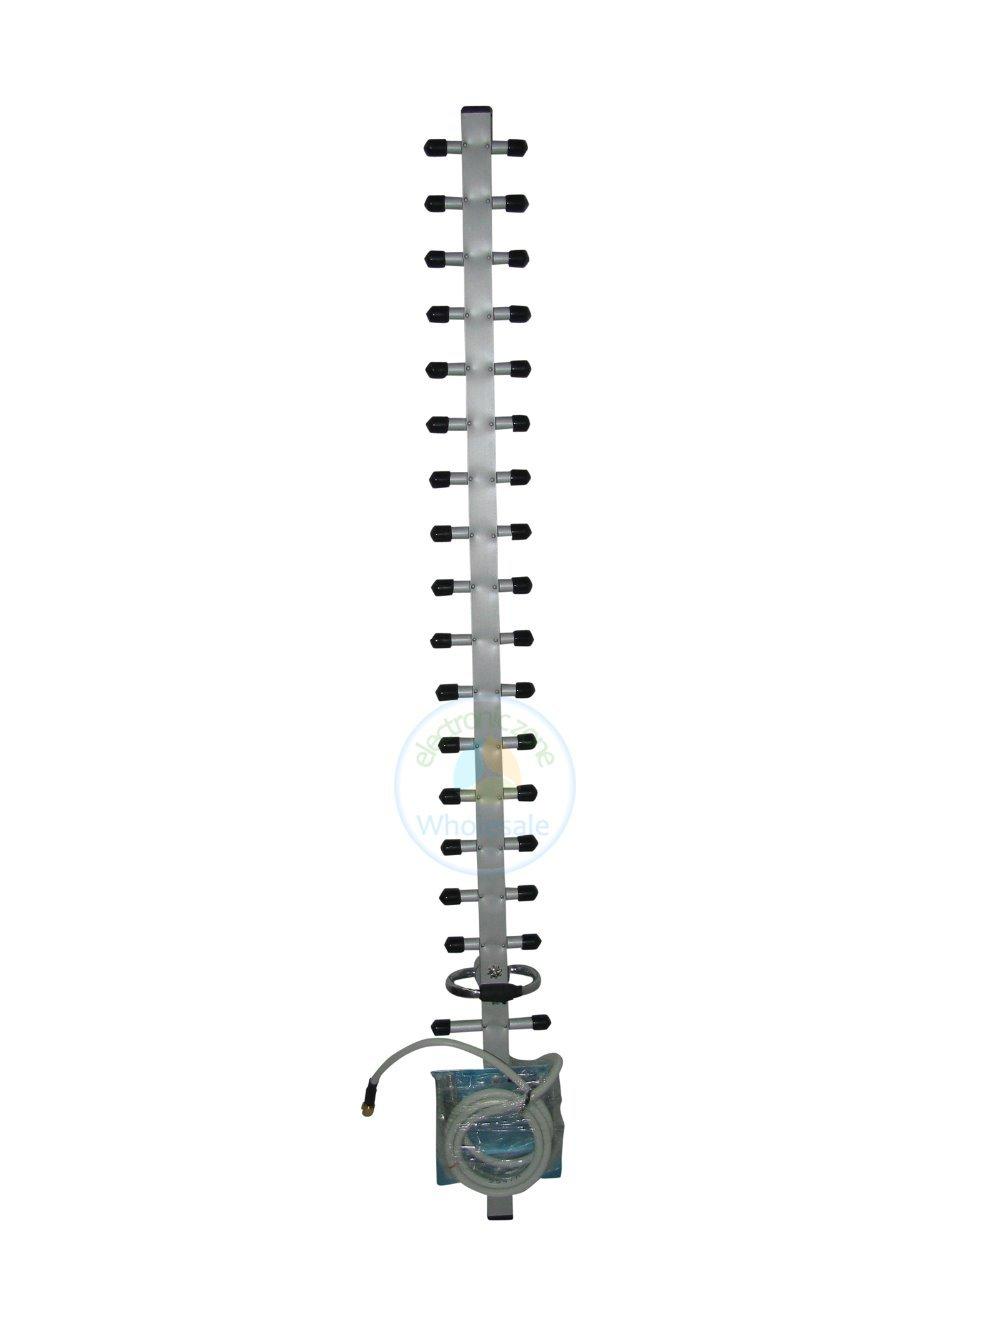 2pcs 2.4G 18dBi Yagi WiFi Antenna RP-SMA for Linksys D-Link Buffalo DD-WRT Tomato Pair(China (Mainland))